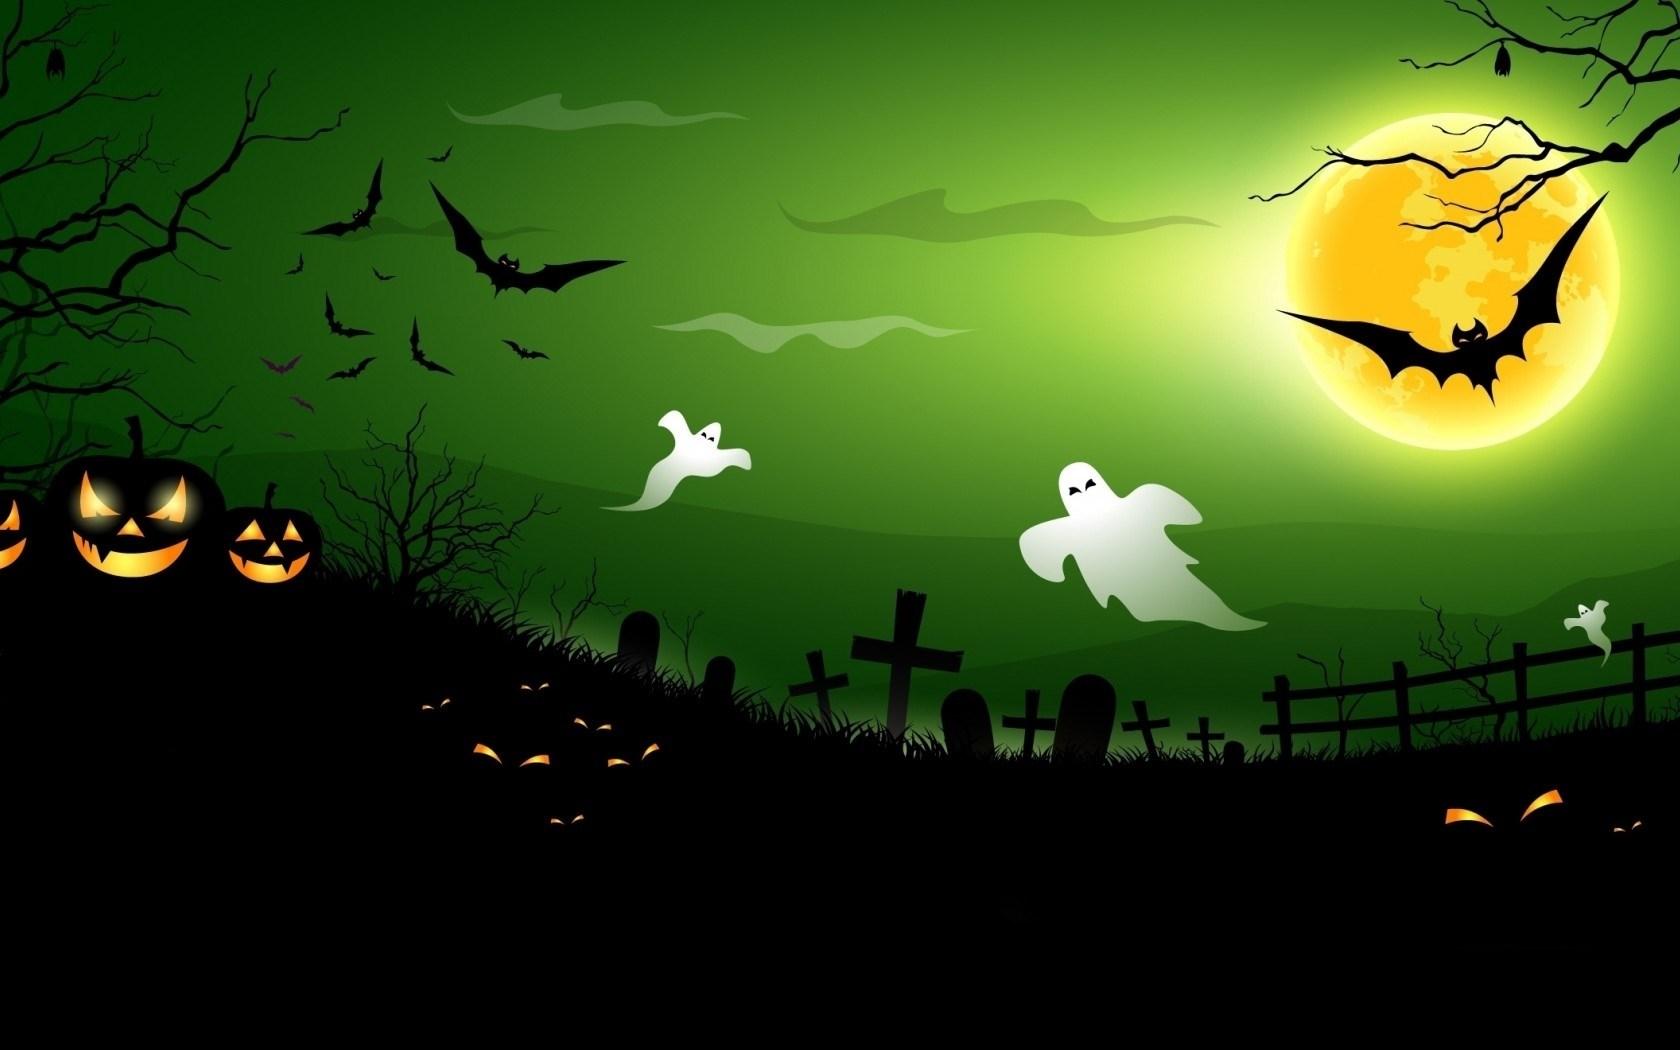 Halloween Creepy Pumpkins Bats Full Moon Midnight Ghosts